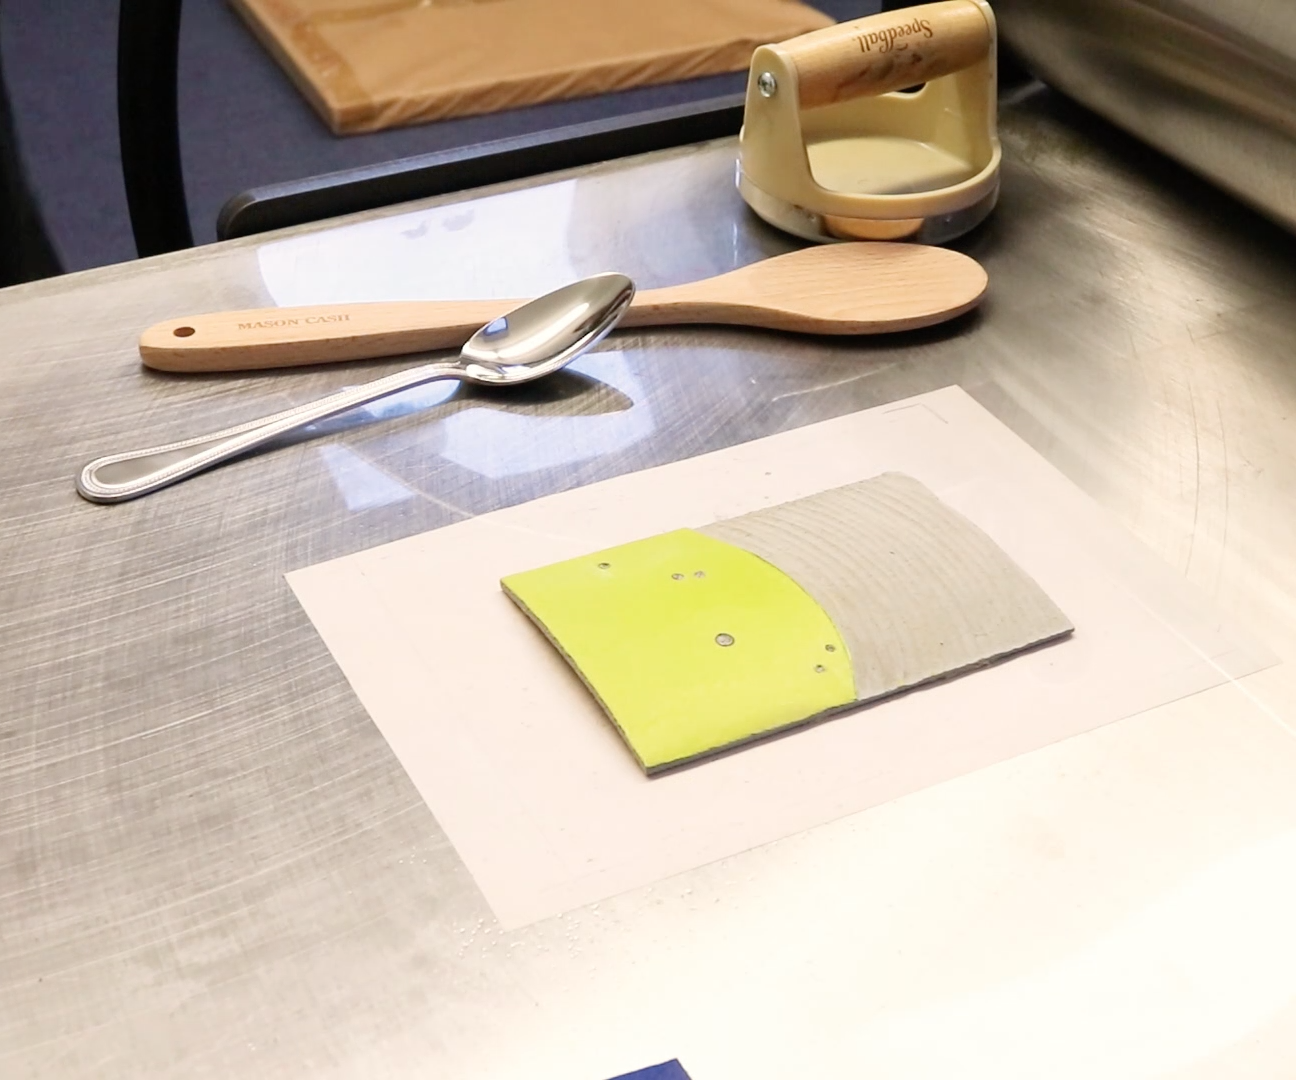 Make a Two-colour Linocut Relief Print